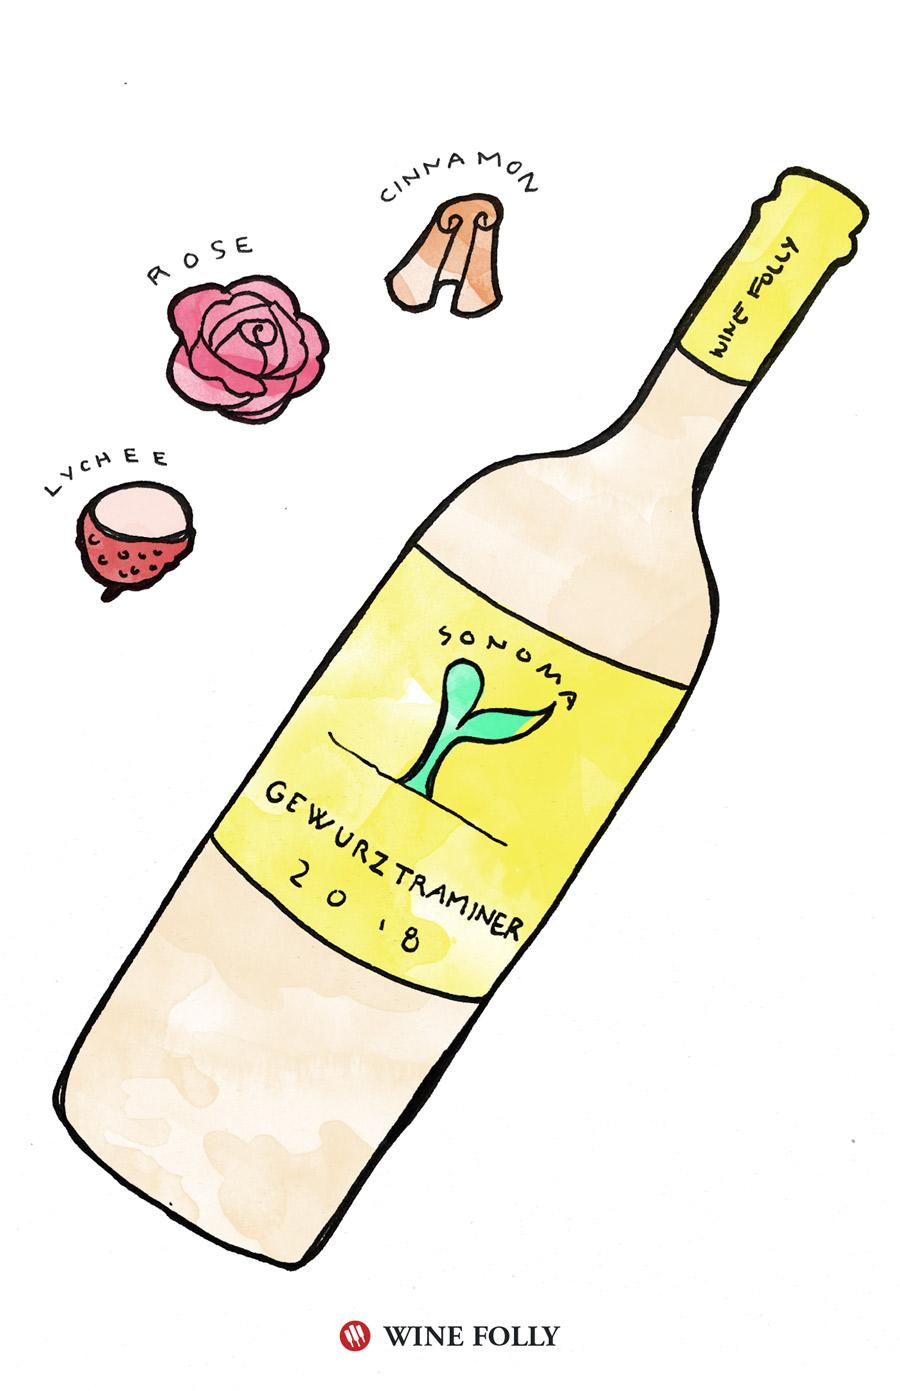 Gewurztraminer Tasting Notes Illustration by Wine Folly